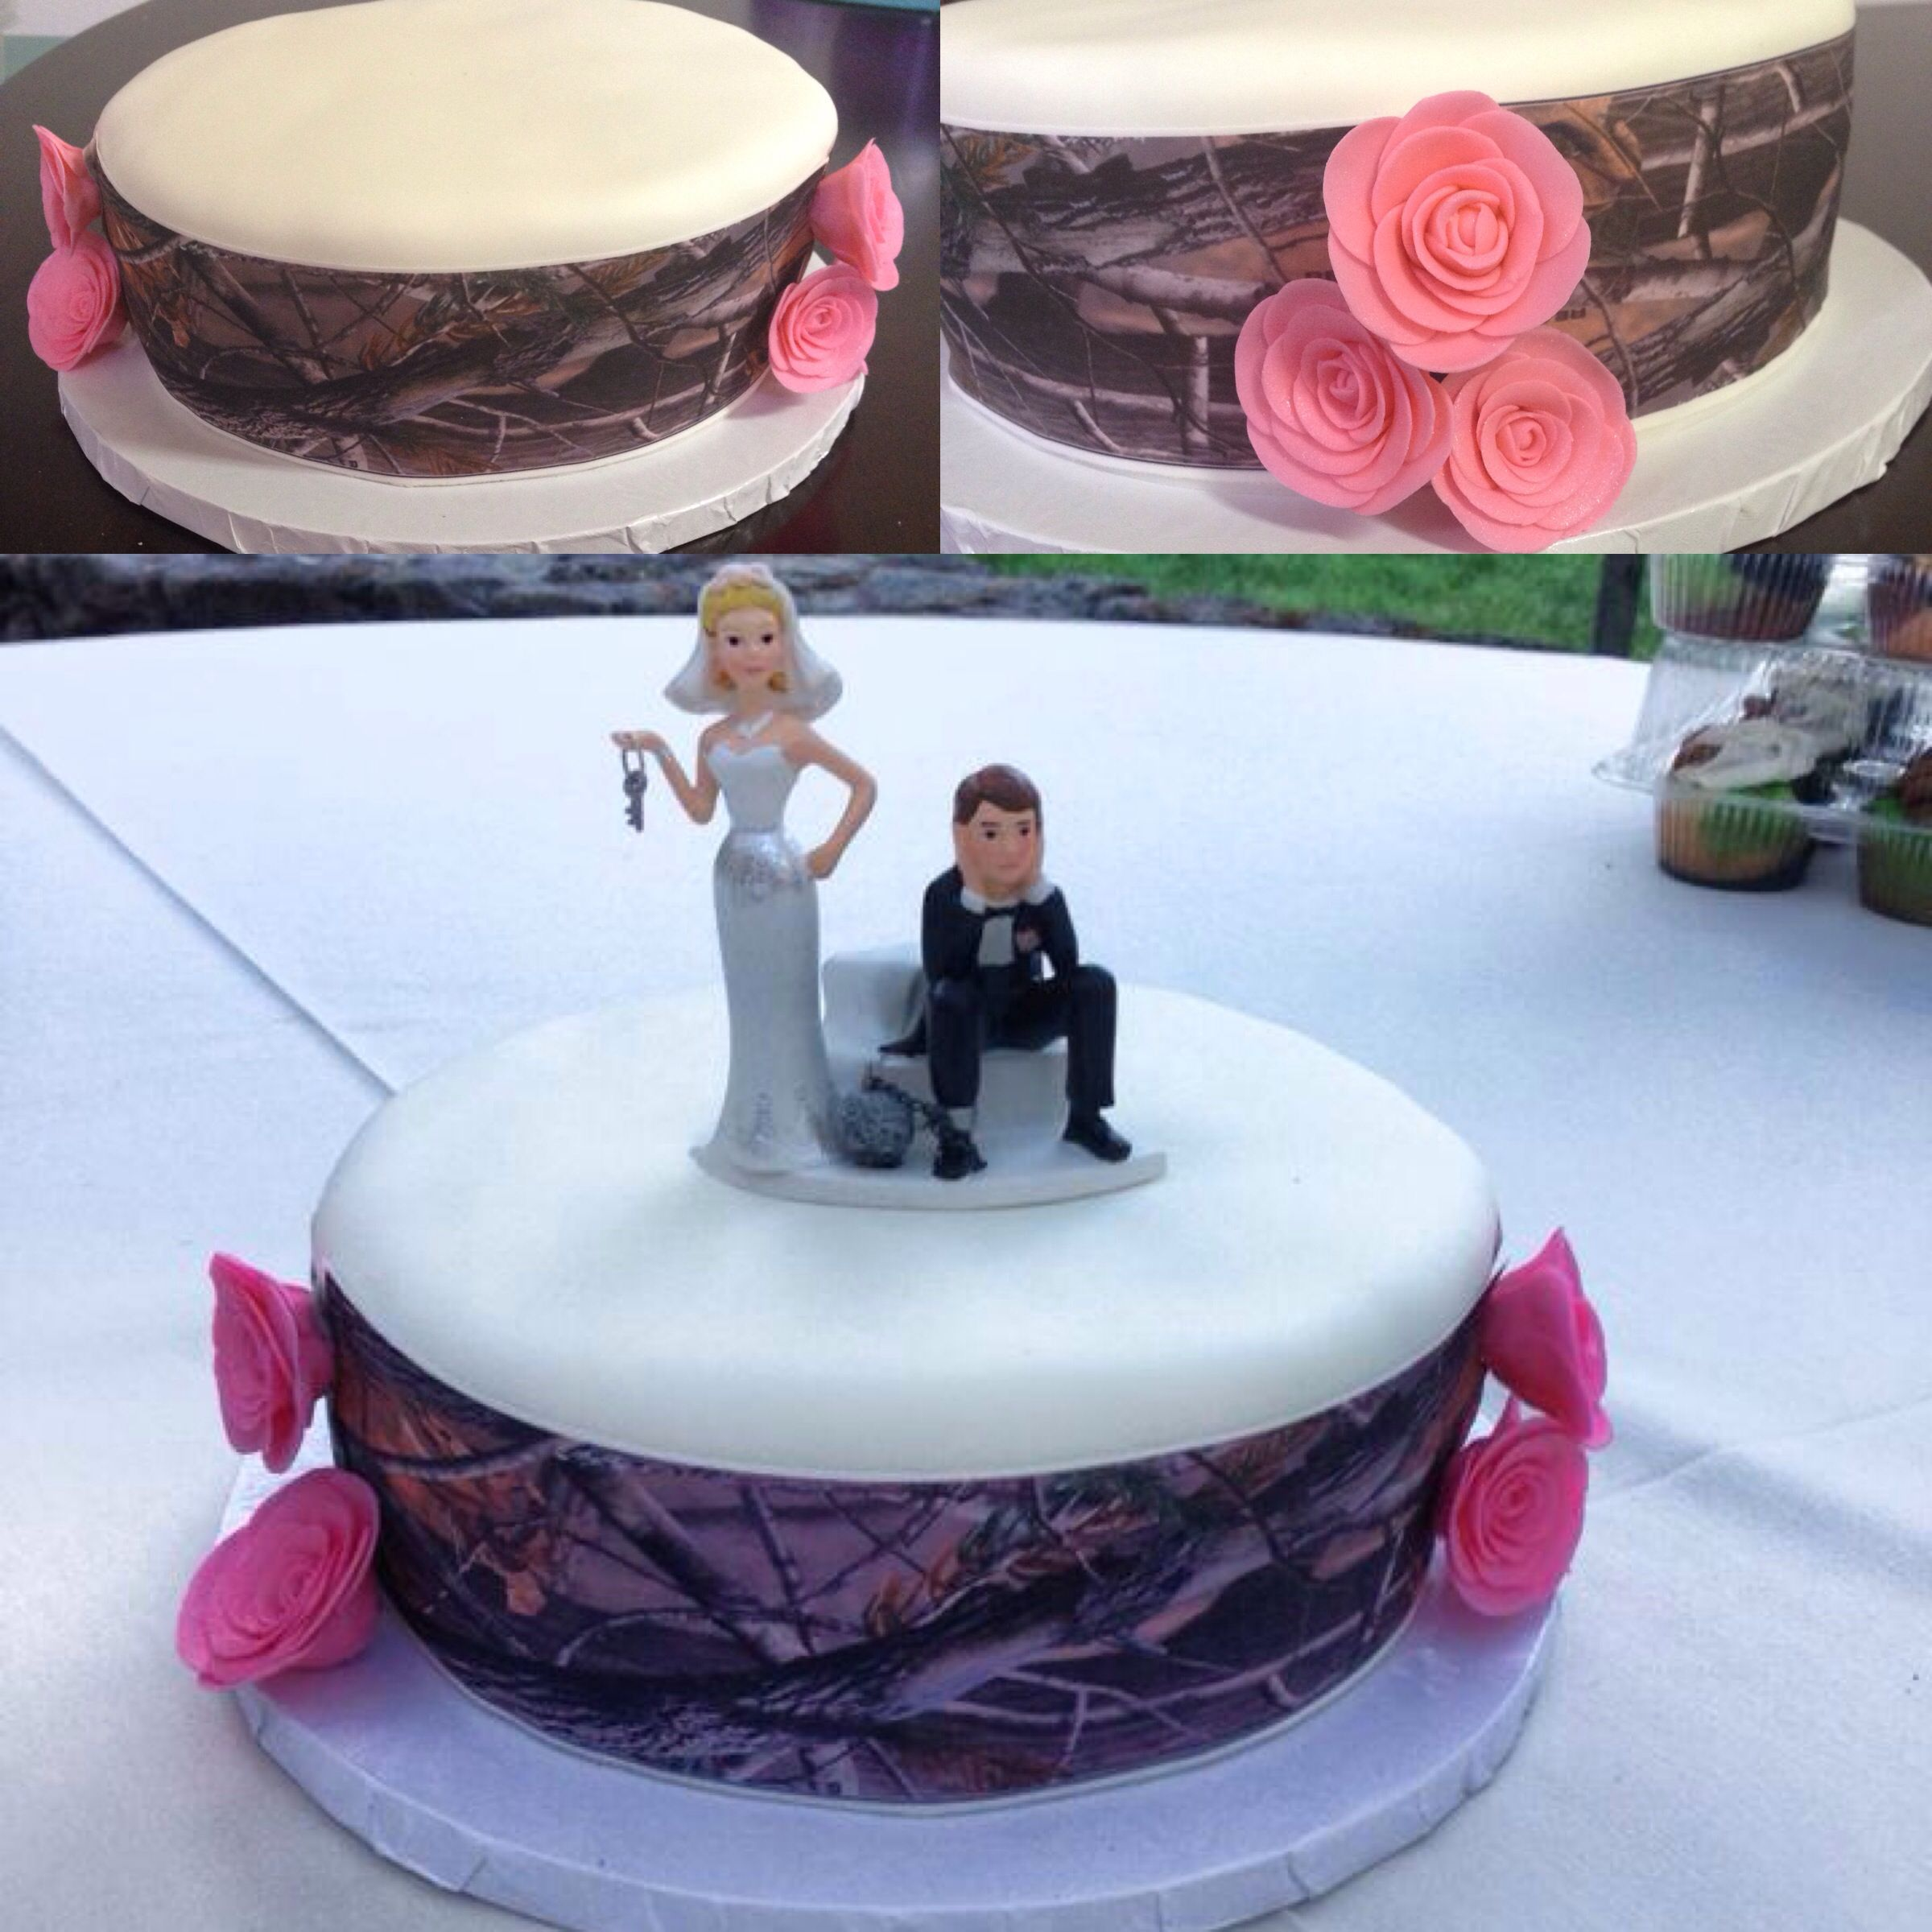 Camoflaugde Weddings Wedding Cake Ideas and Designs